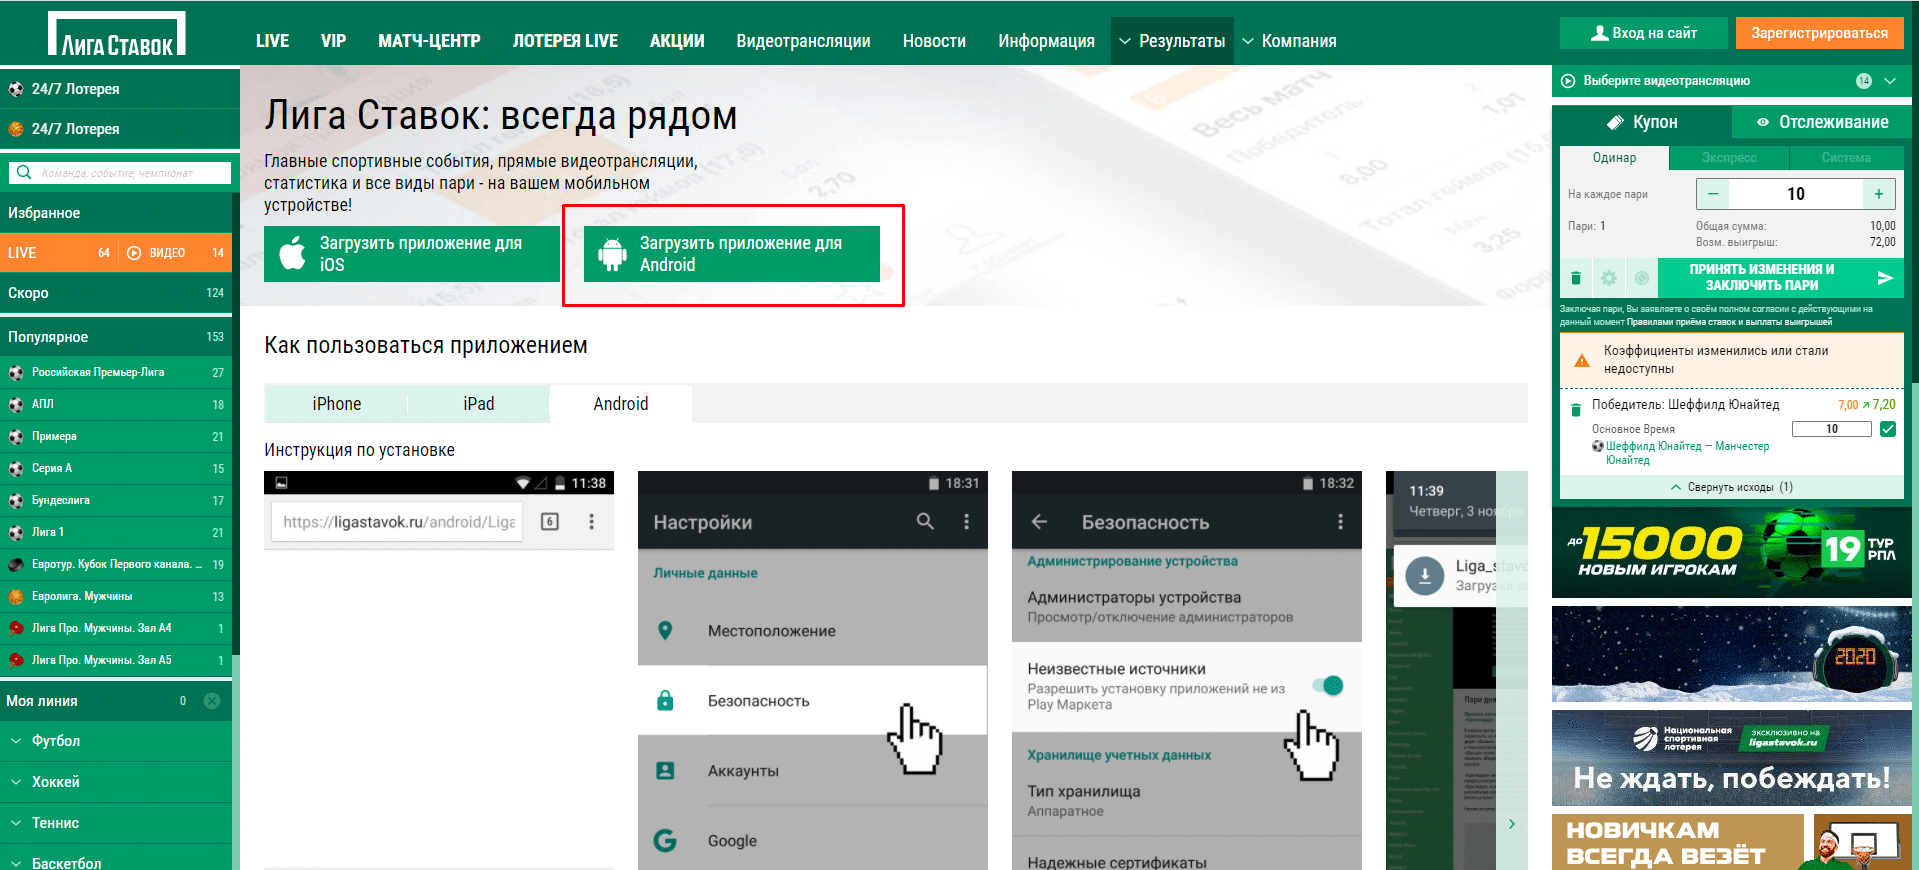 Кнопка загрузки приложения на Android